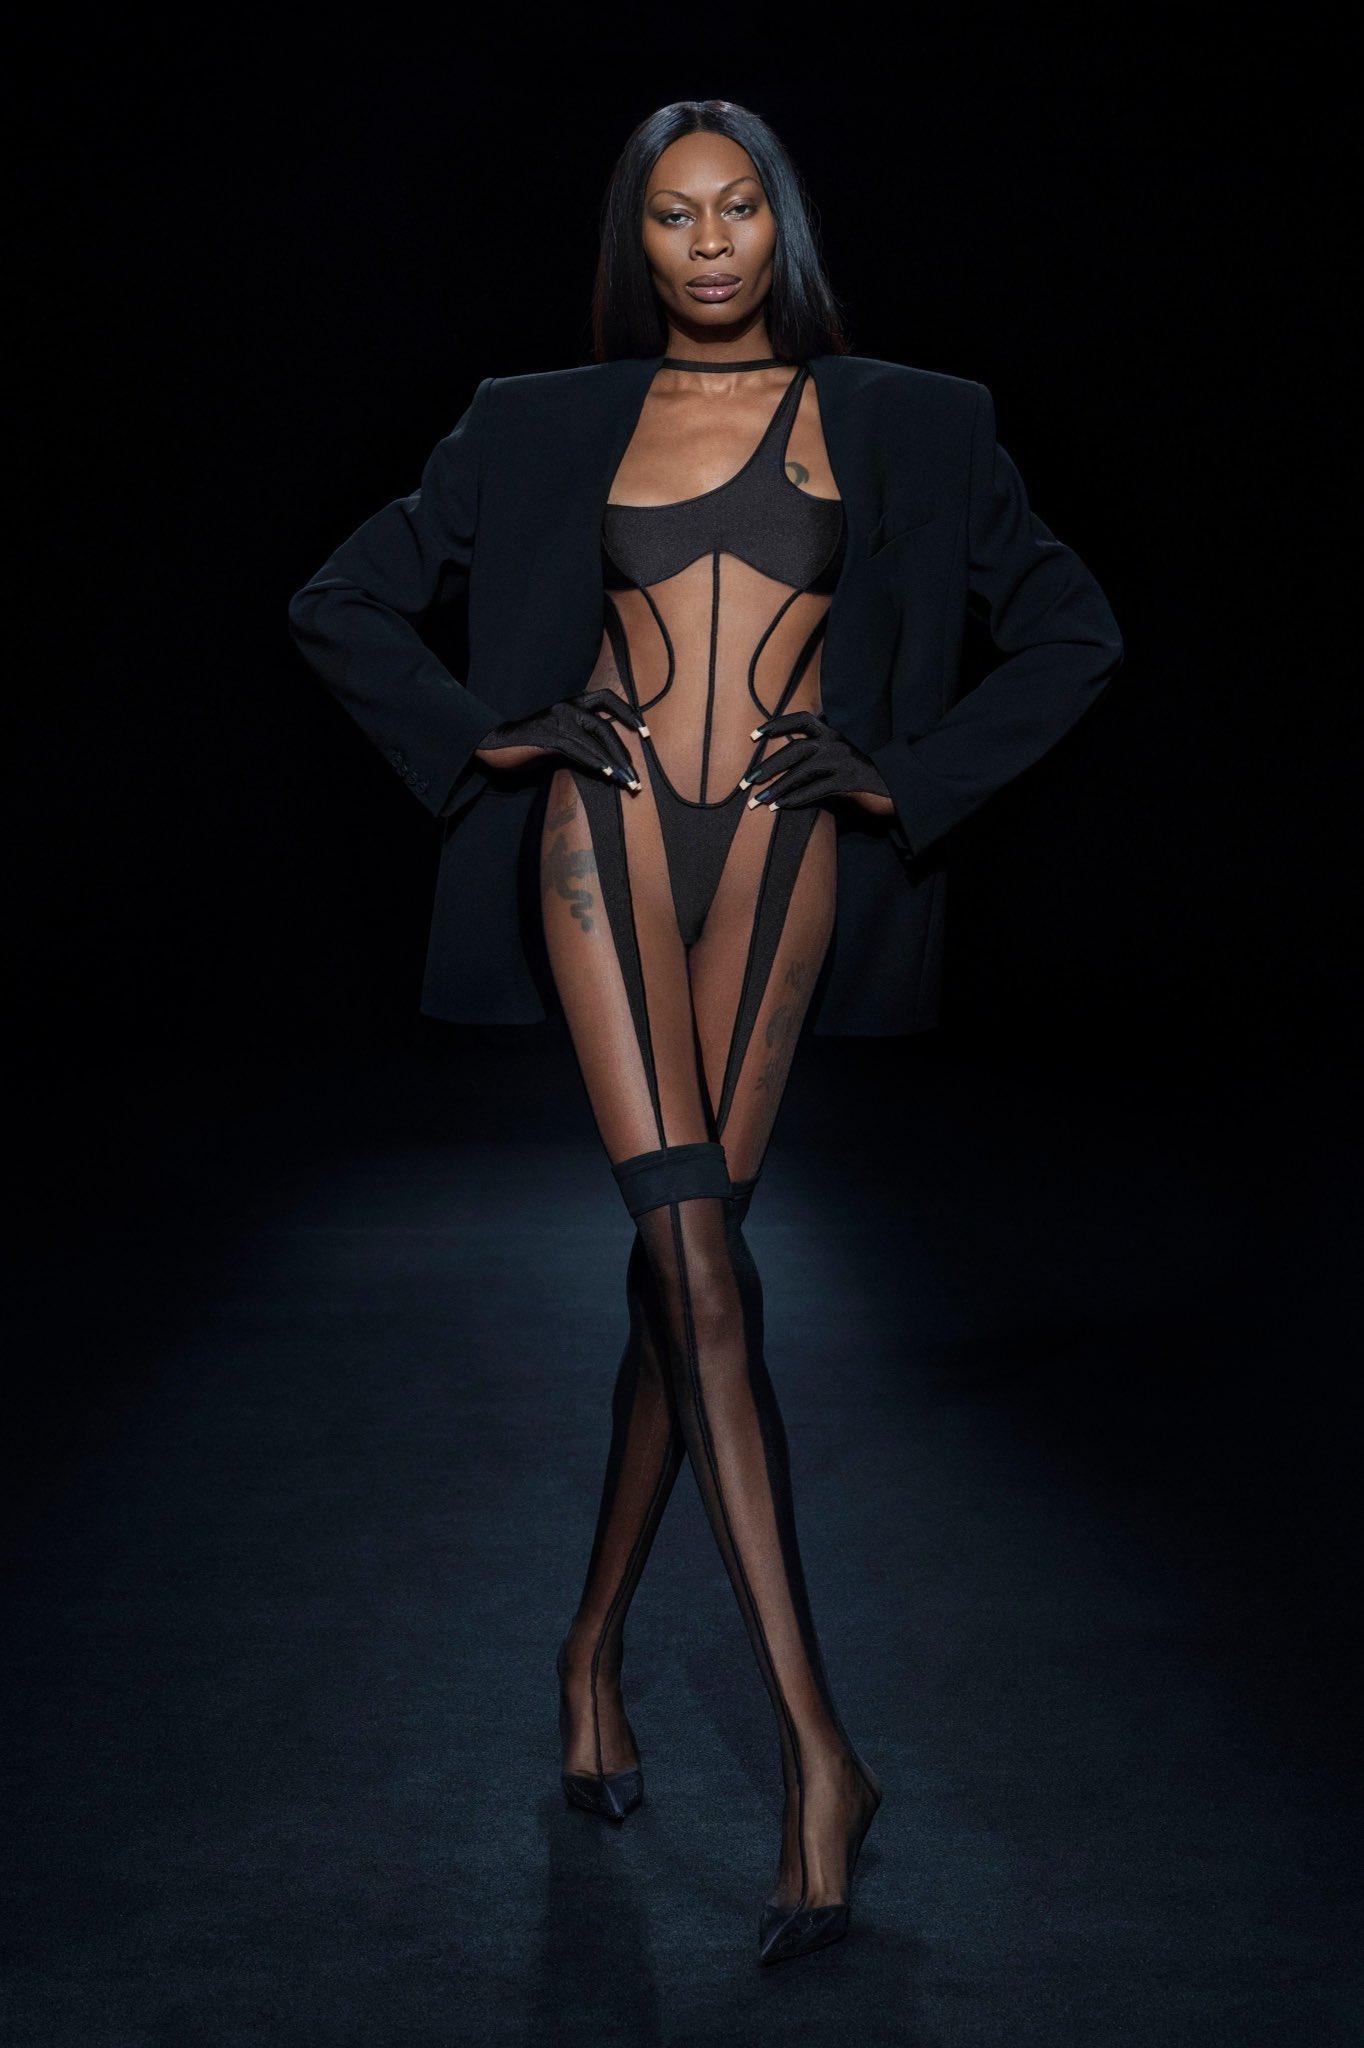 Dominique Jackson for Mugler SS21 - Entertainment News - Gaga Daily